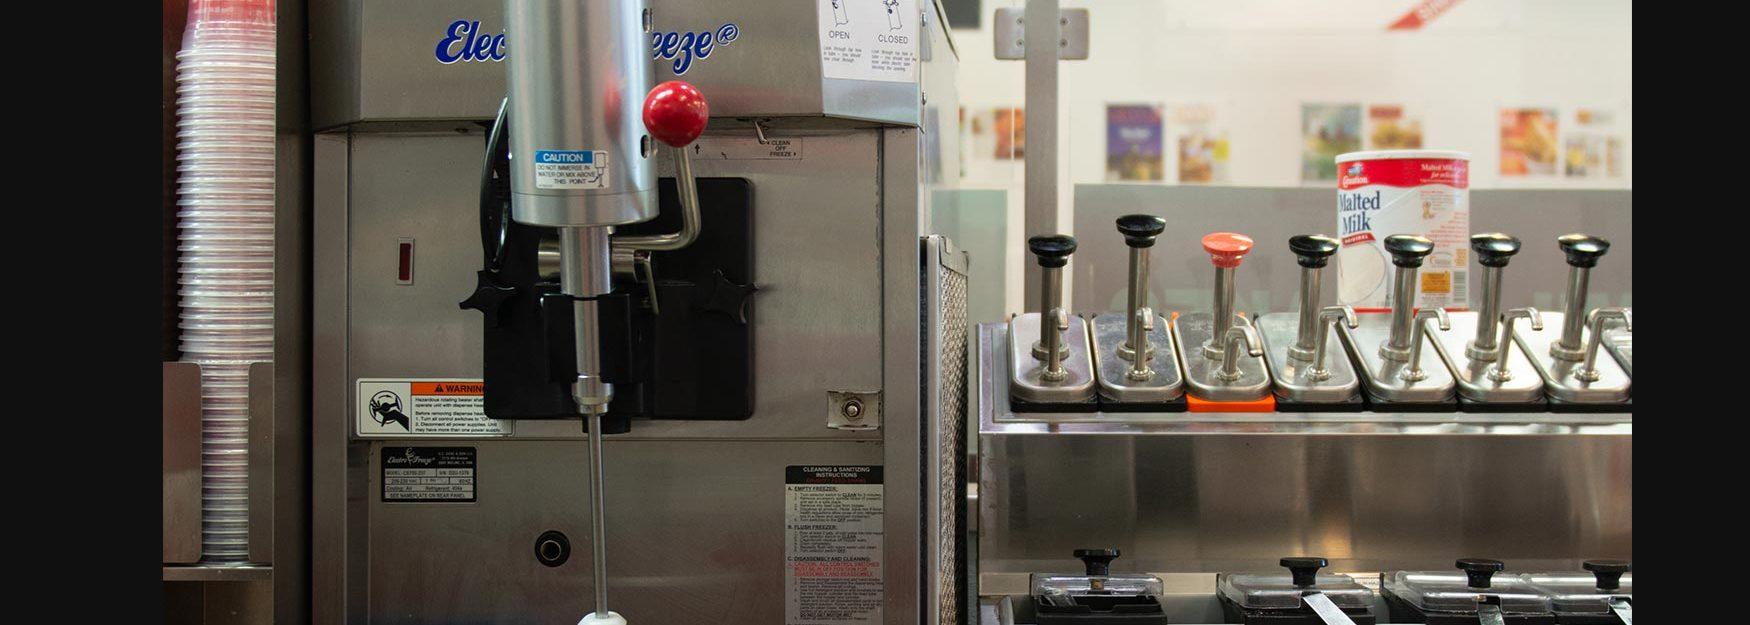 Electro Freeze Gravity Fed Countertop Shake Machine